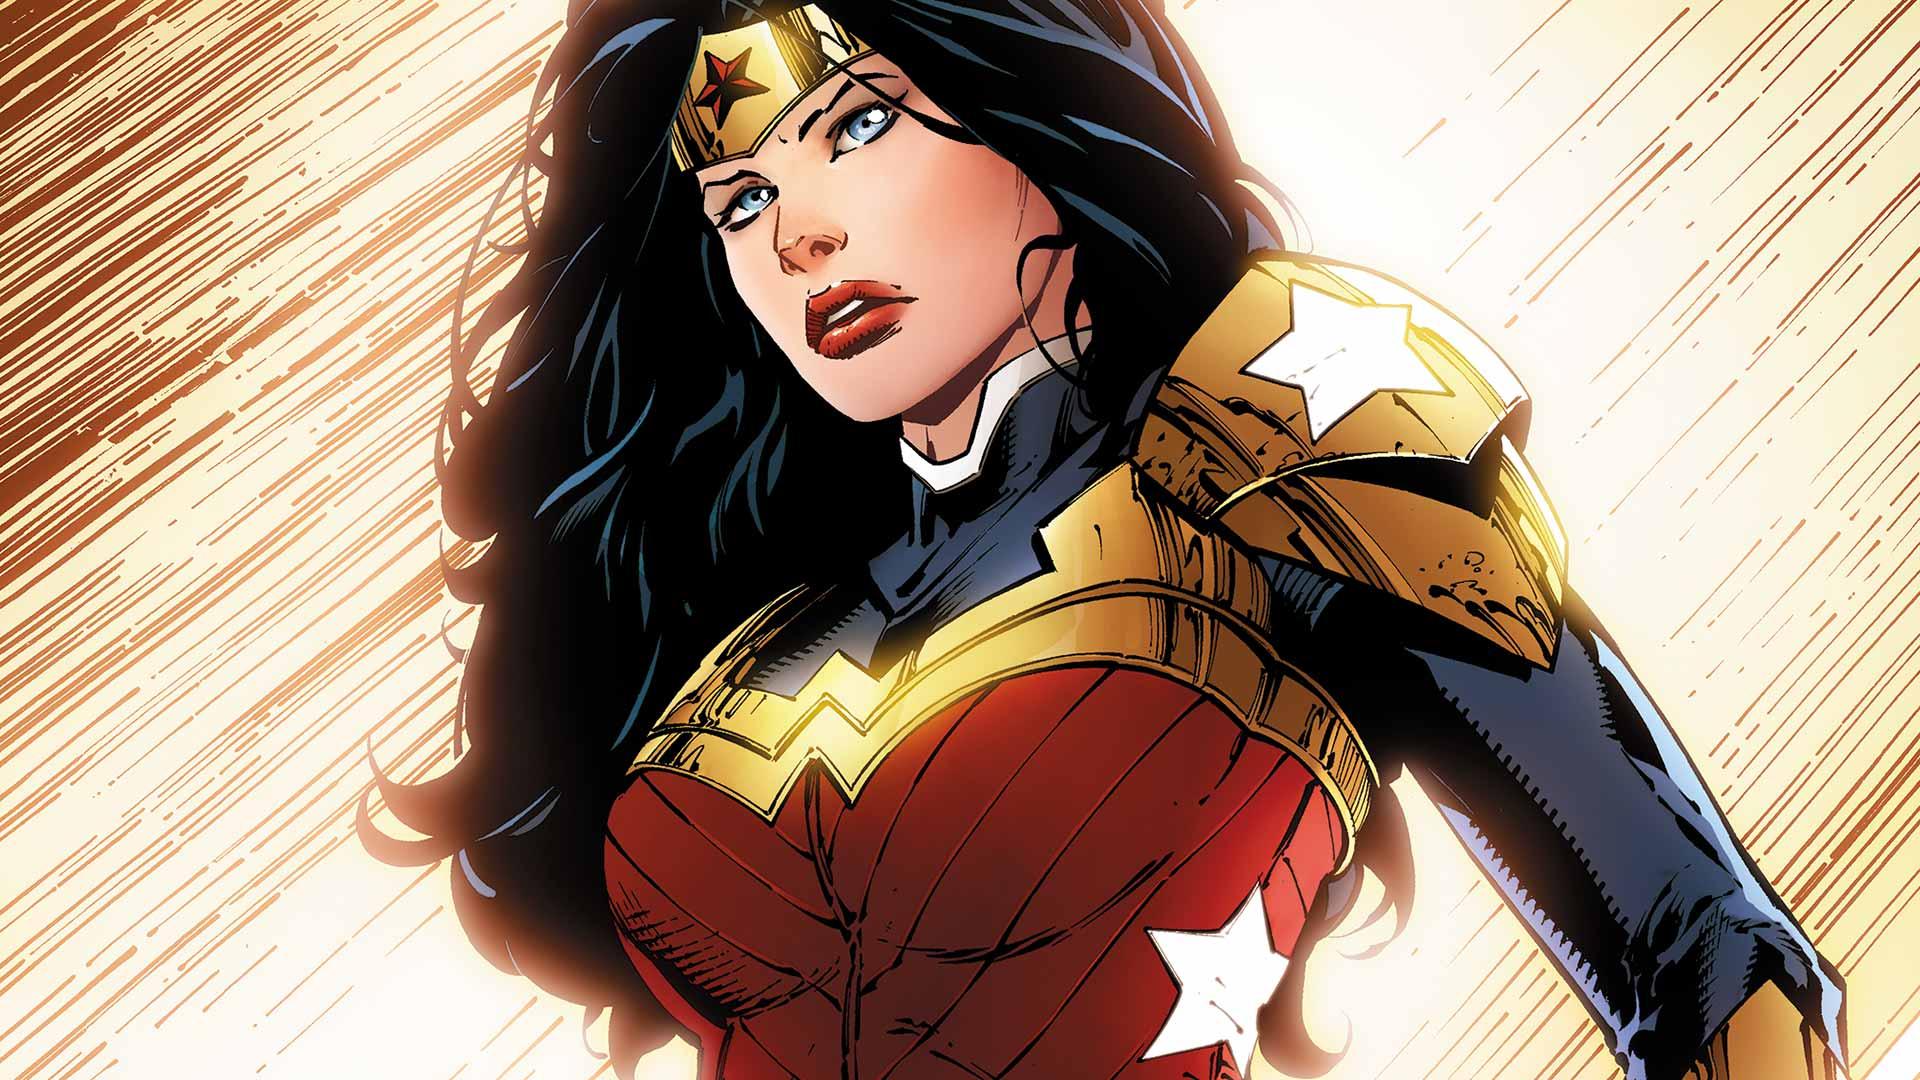 mulher maravilha hq dc comics h. g. peter (6)